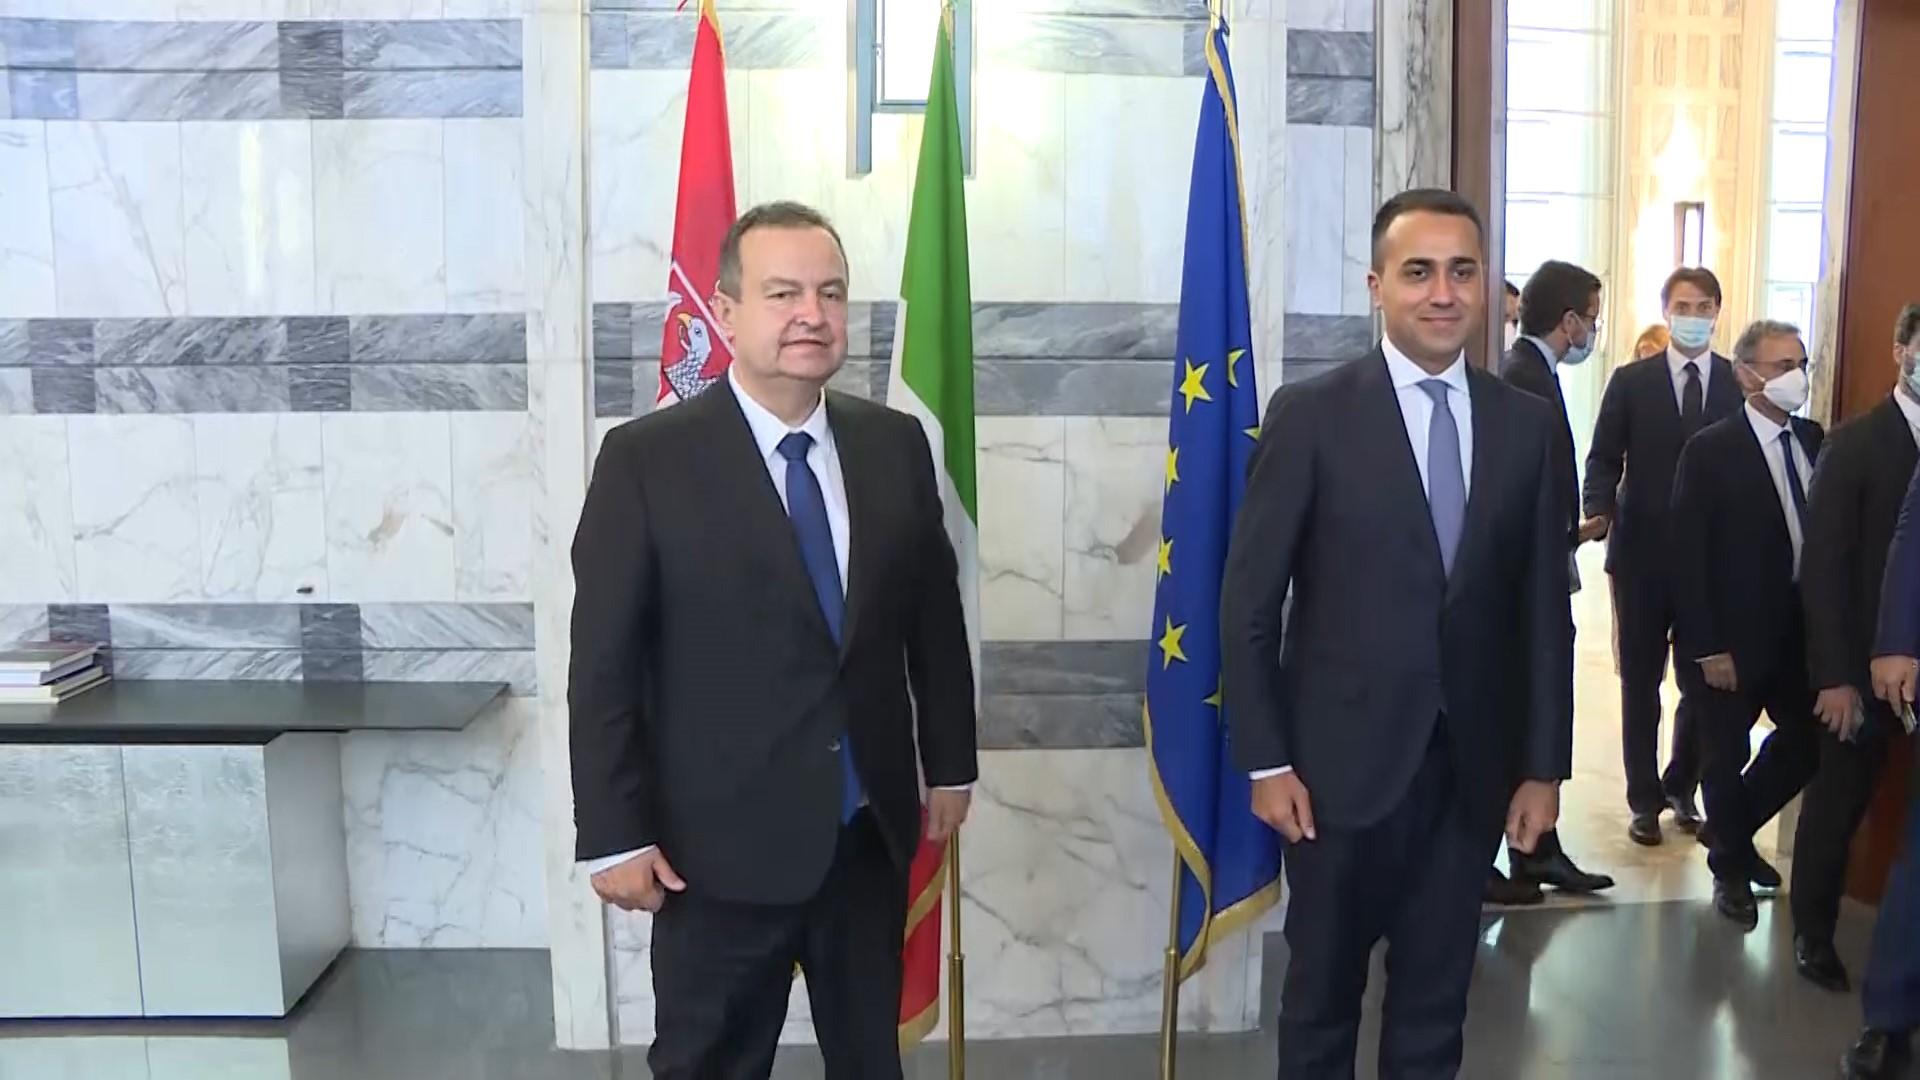 Serbia: Dačić meets with Di Maio in Rome